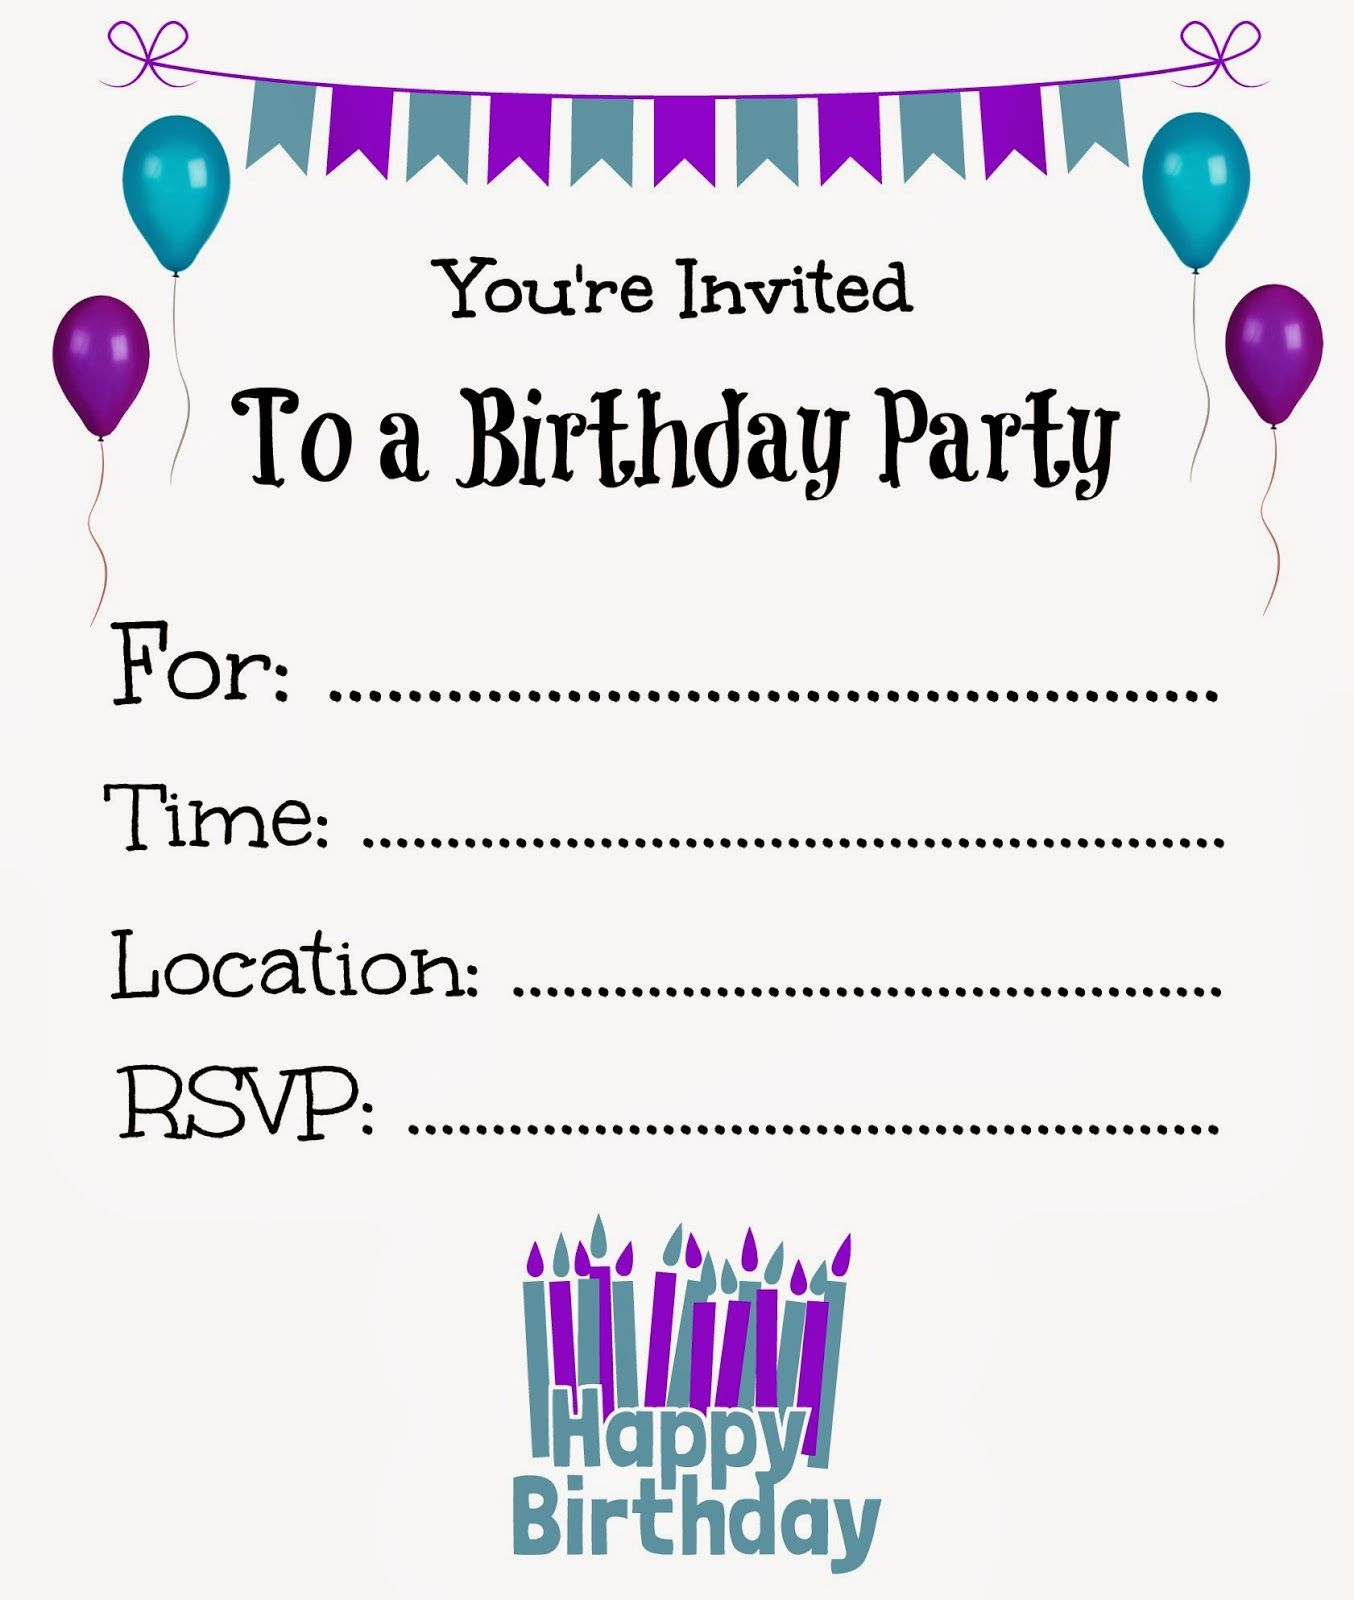 Free Printable Birthday Invitations For Kids #freeprintables - Free Printable Party Invitations